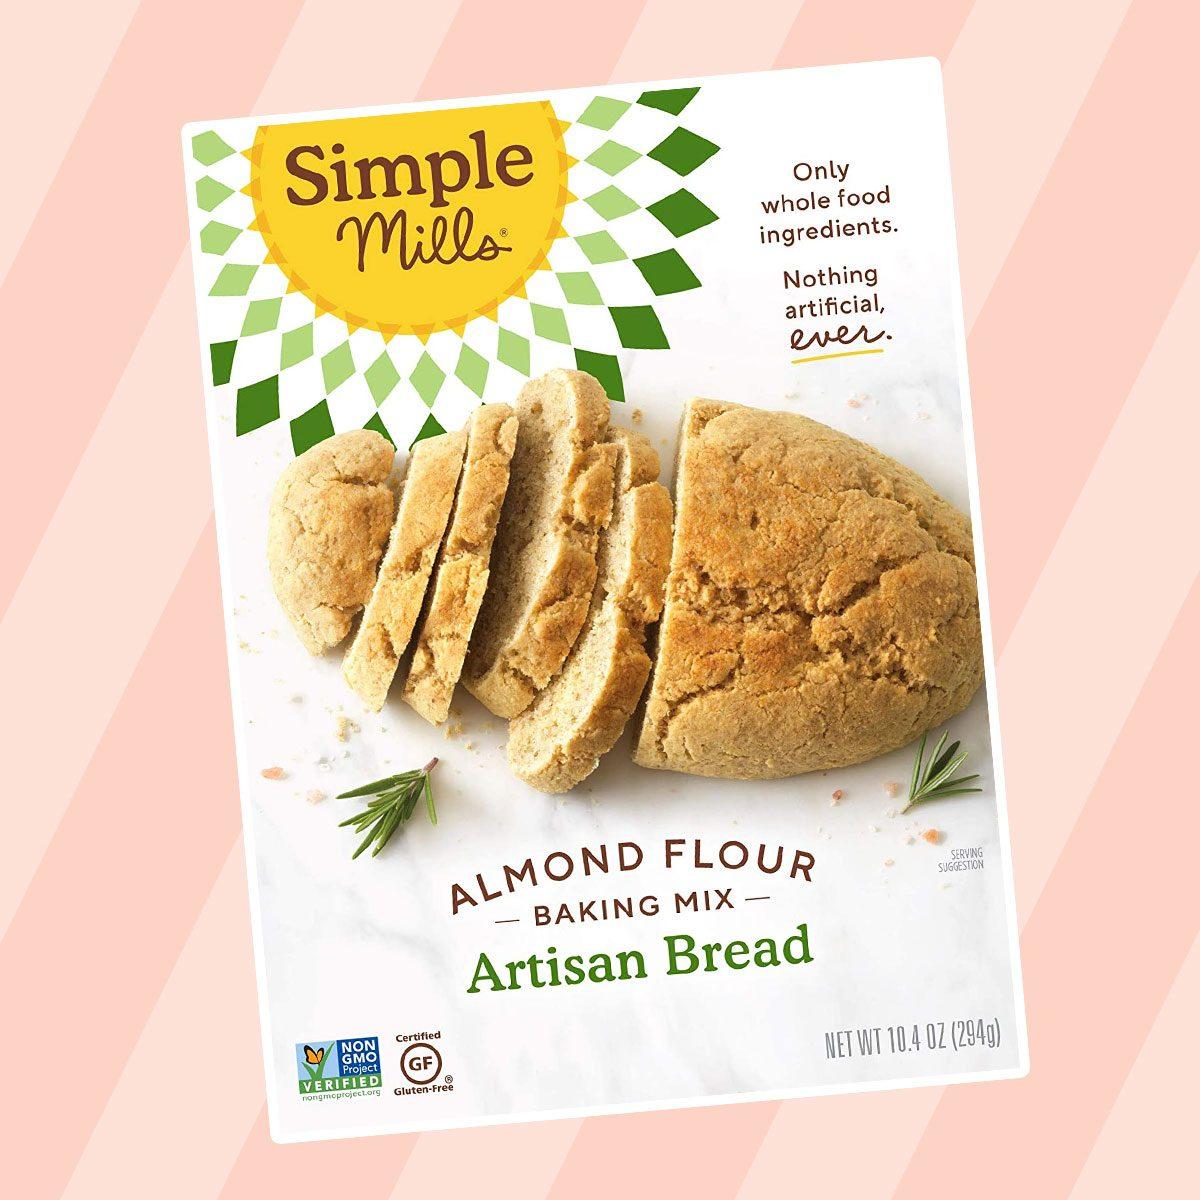 Simple Mills Almond Flour Baking Mix paleo snacks